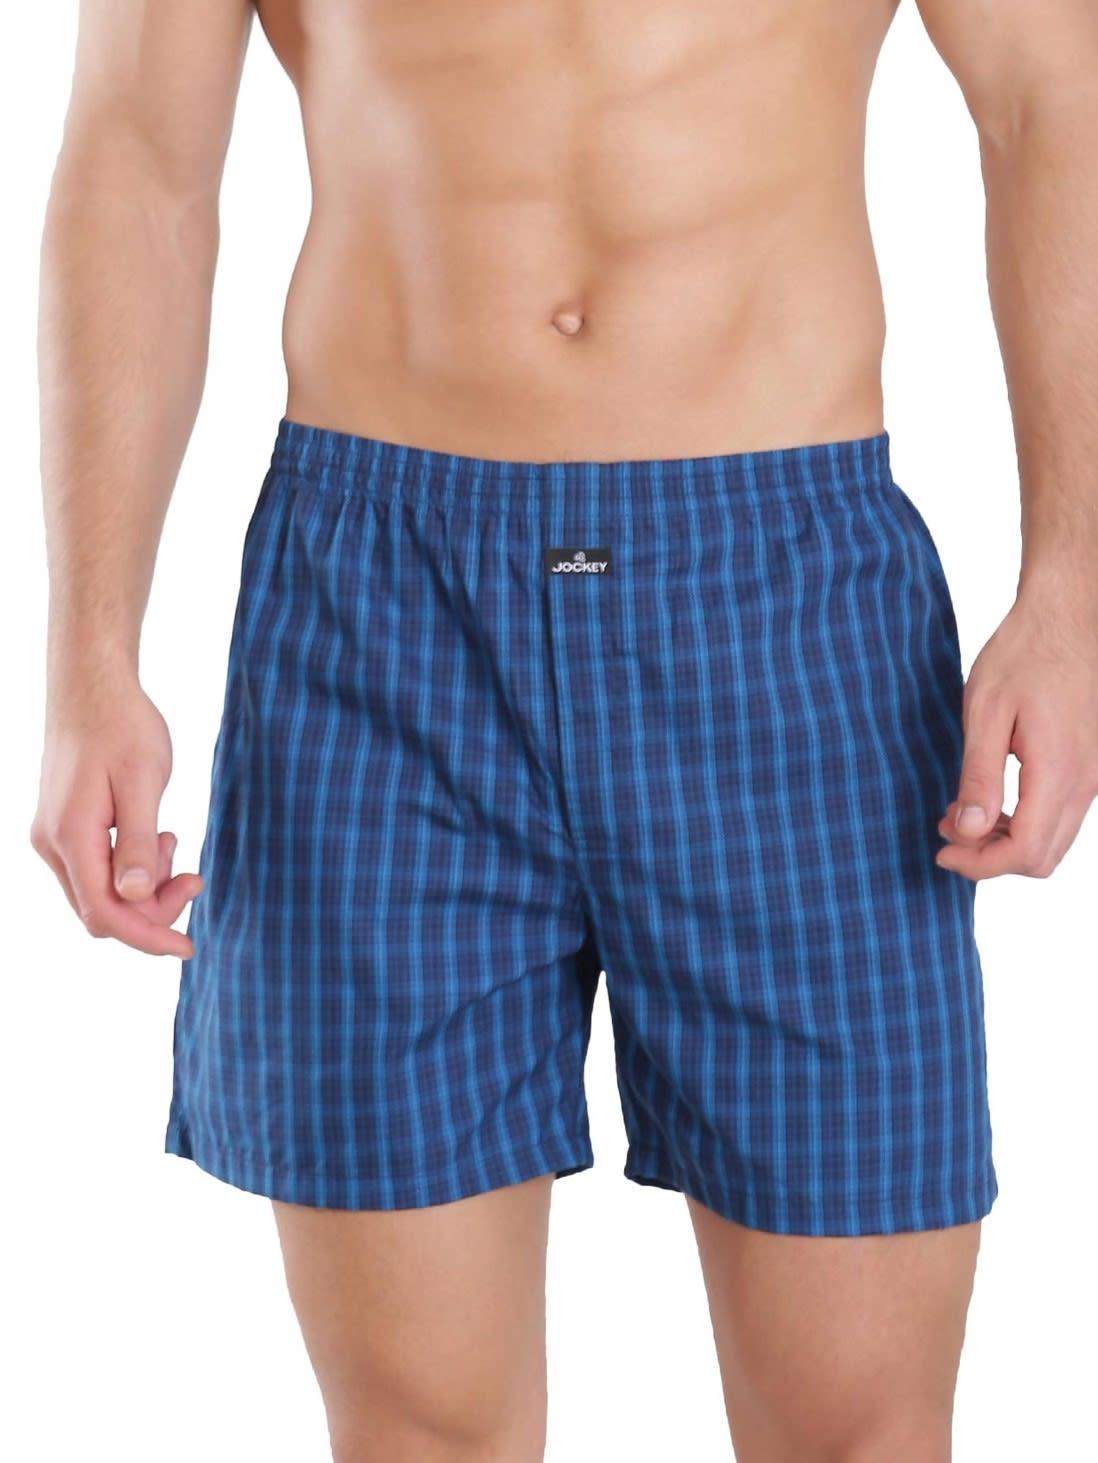 Jockey Men Outerwear Bottoms Dark Assorted Checks Boxer Shorts